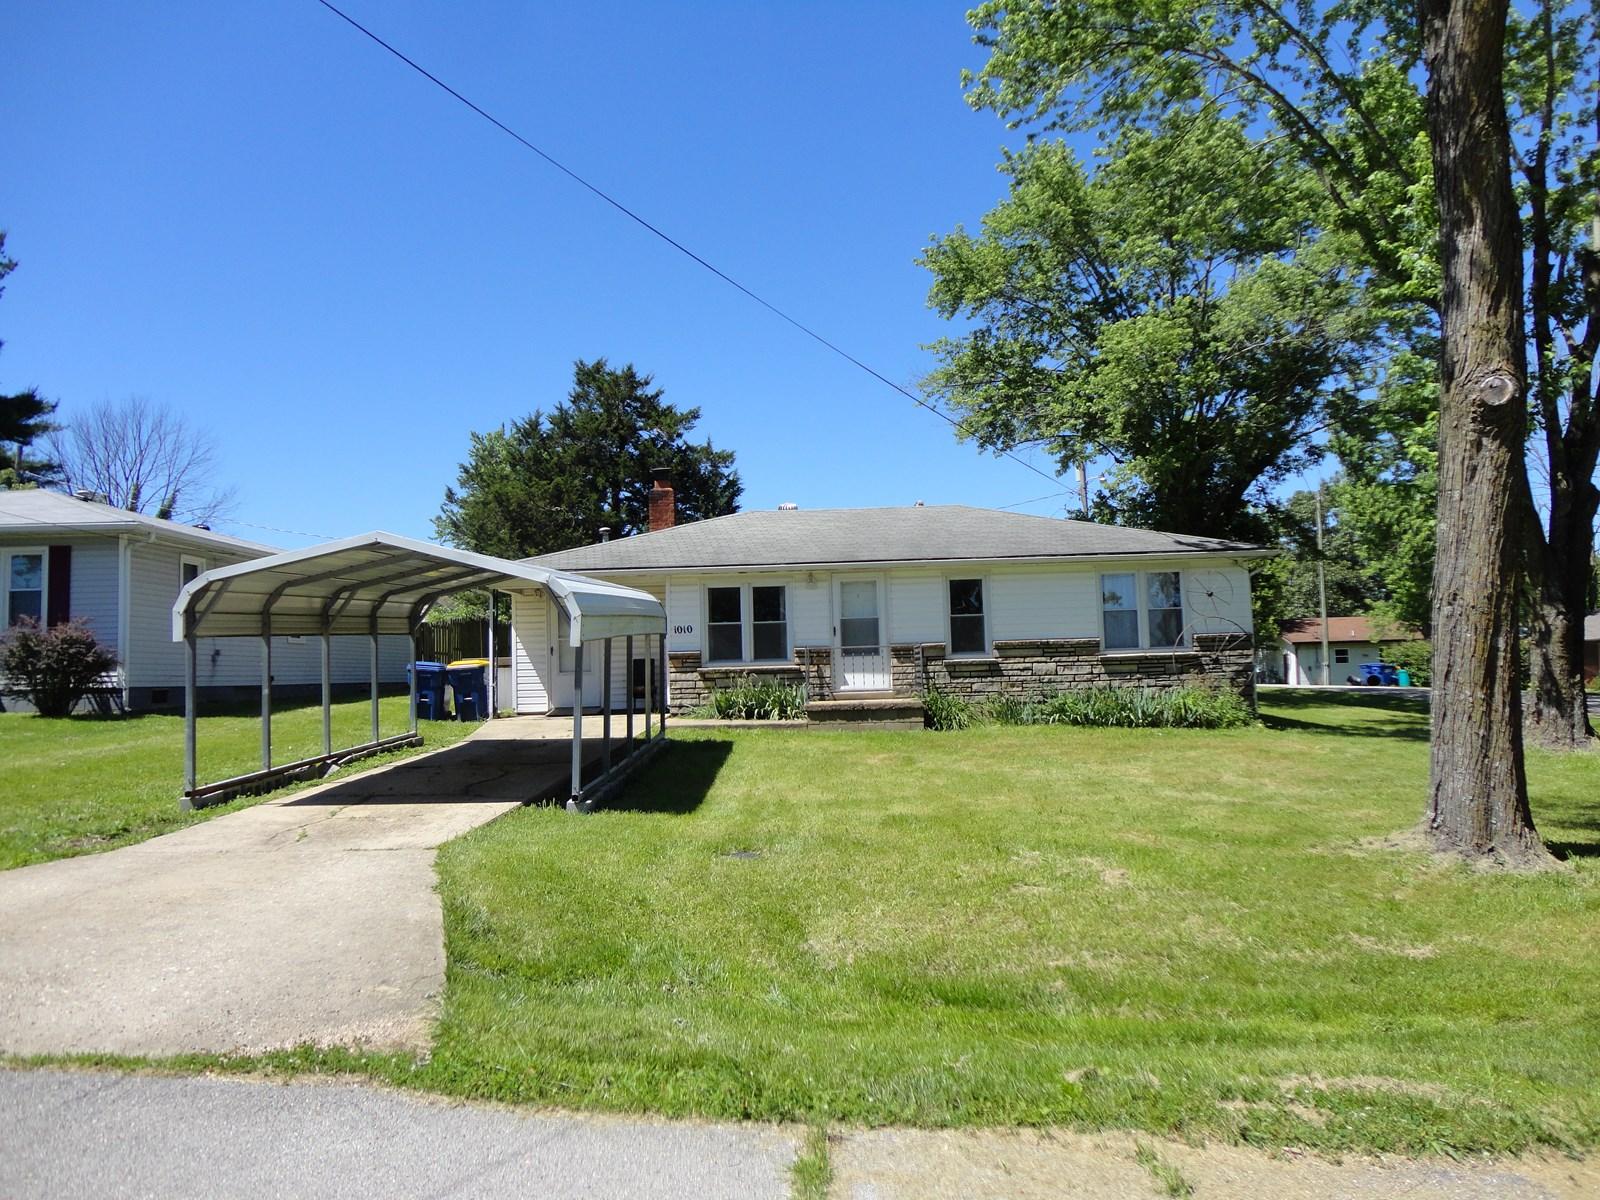 2 bedroom, 1 bath on corner lot in Salem Missouri